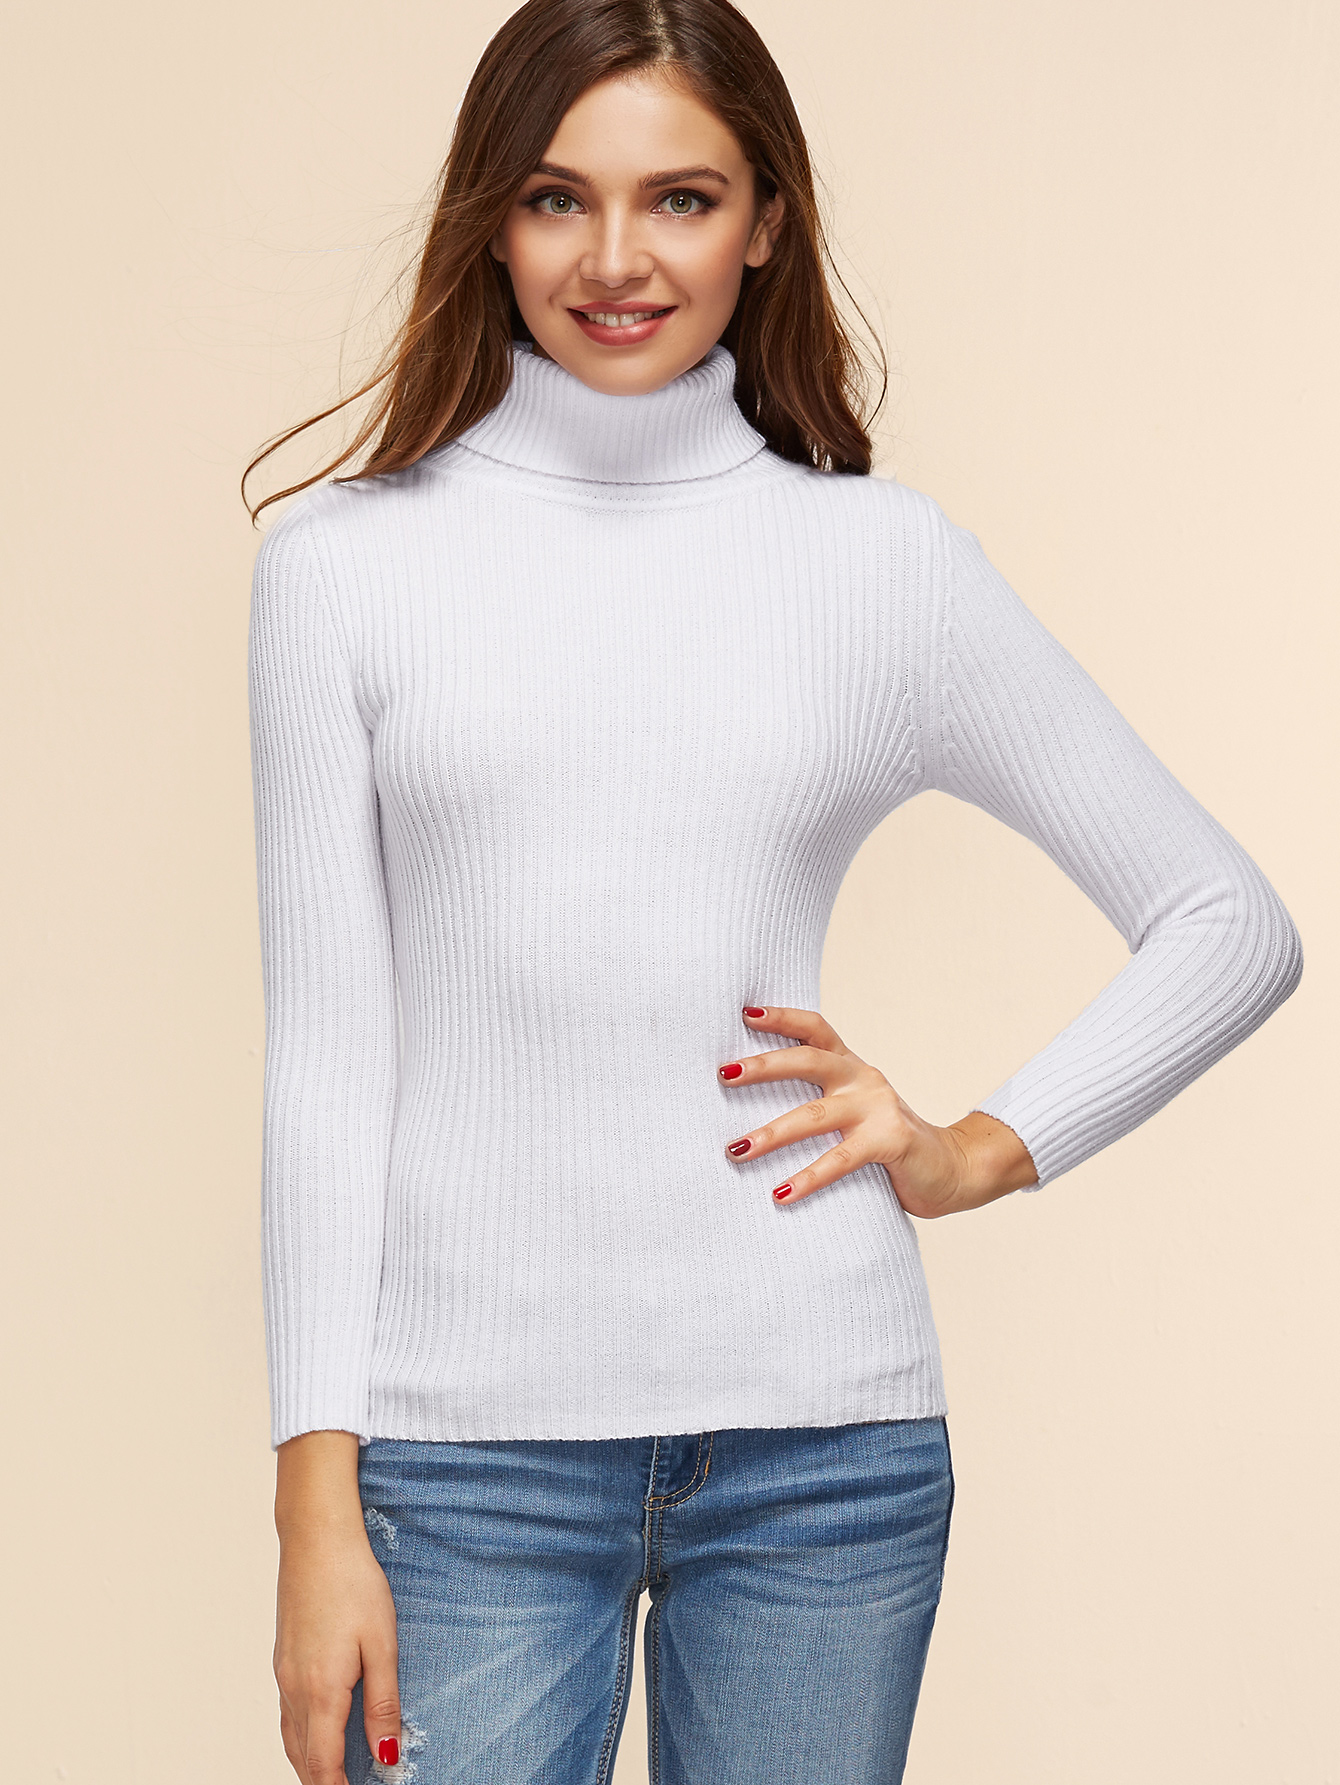 sweater161107453_2